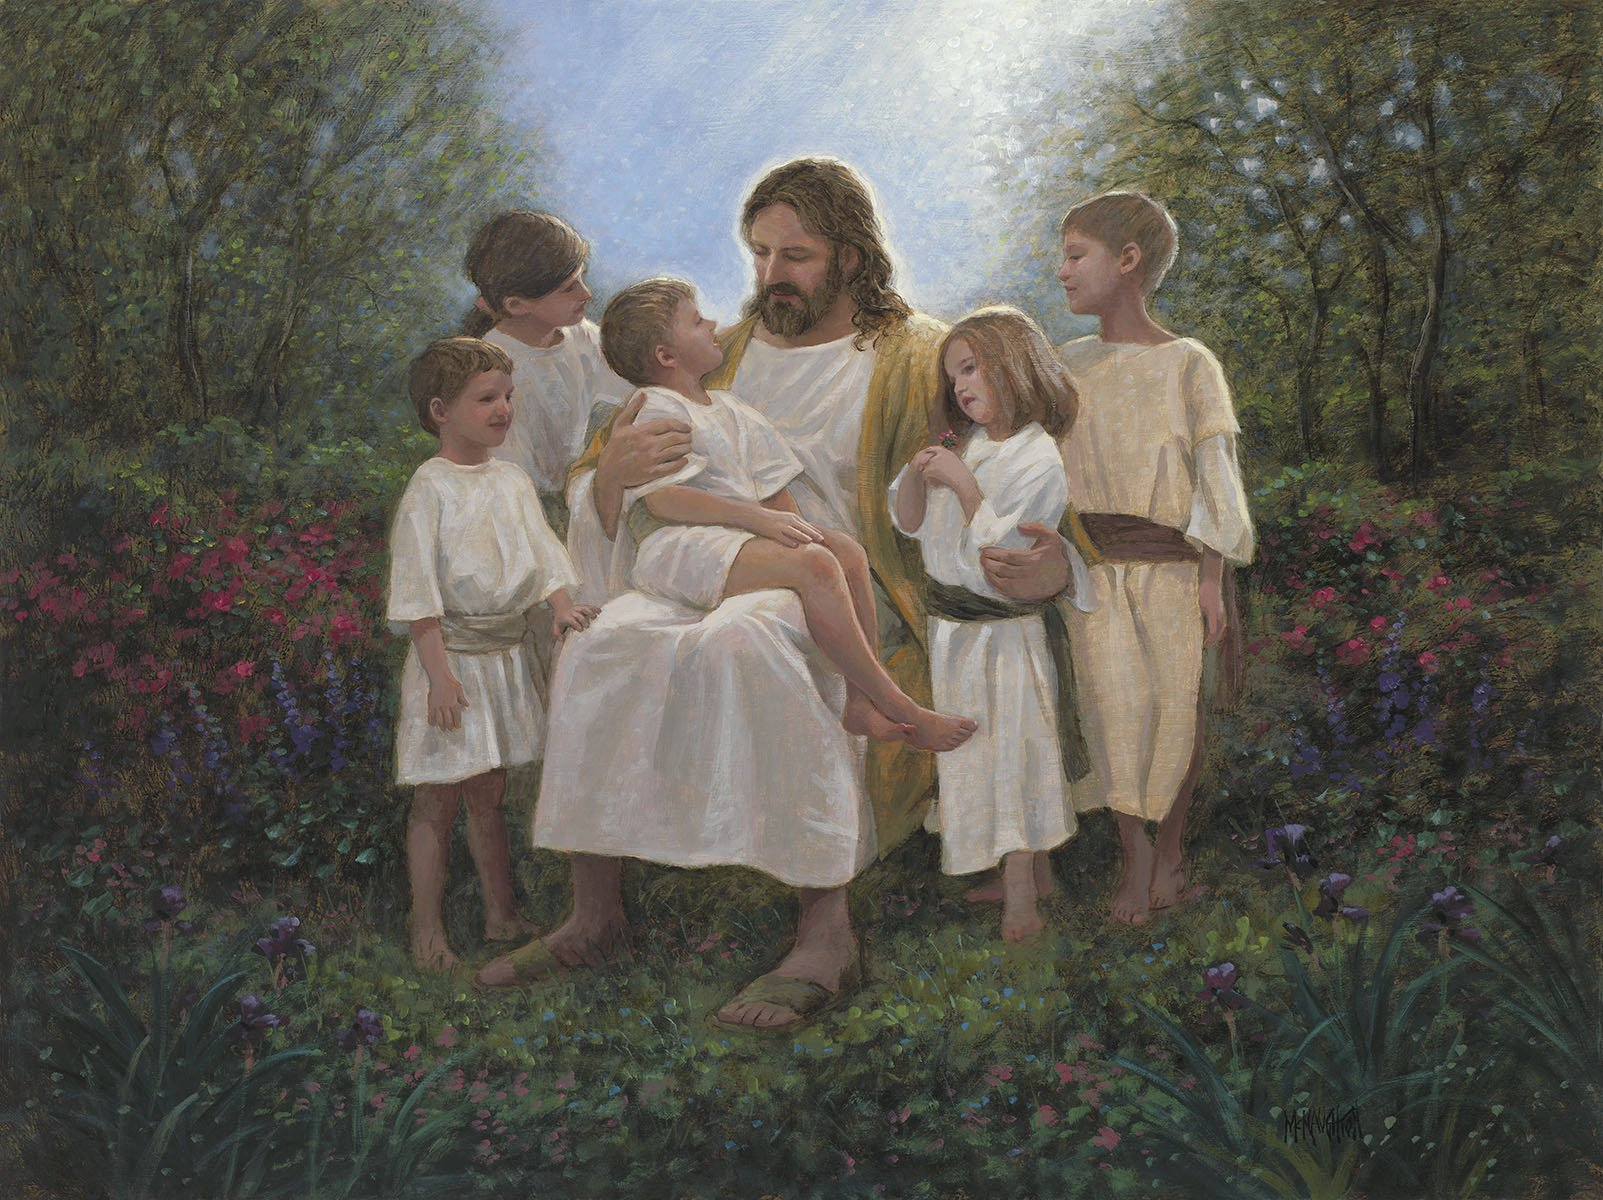 DT-Digital Prints AL-3761-1 Multi - Jesus with the Children 36 x 44 Panel